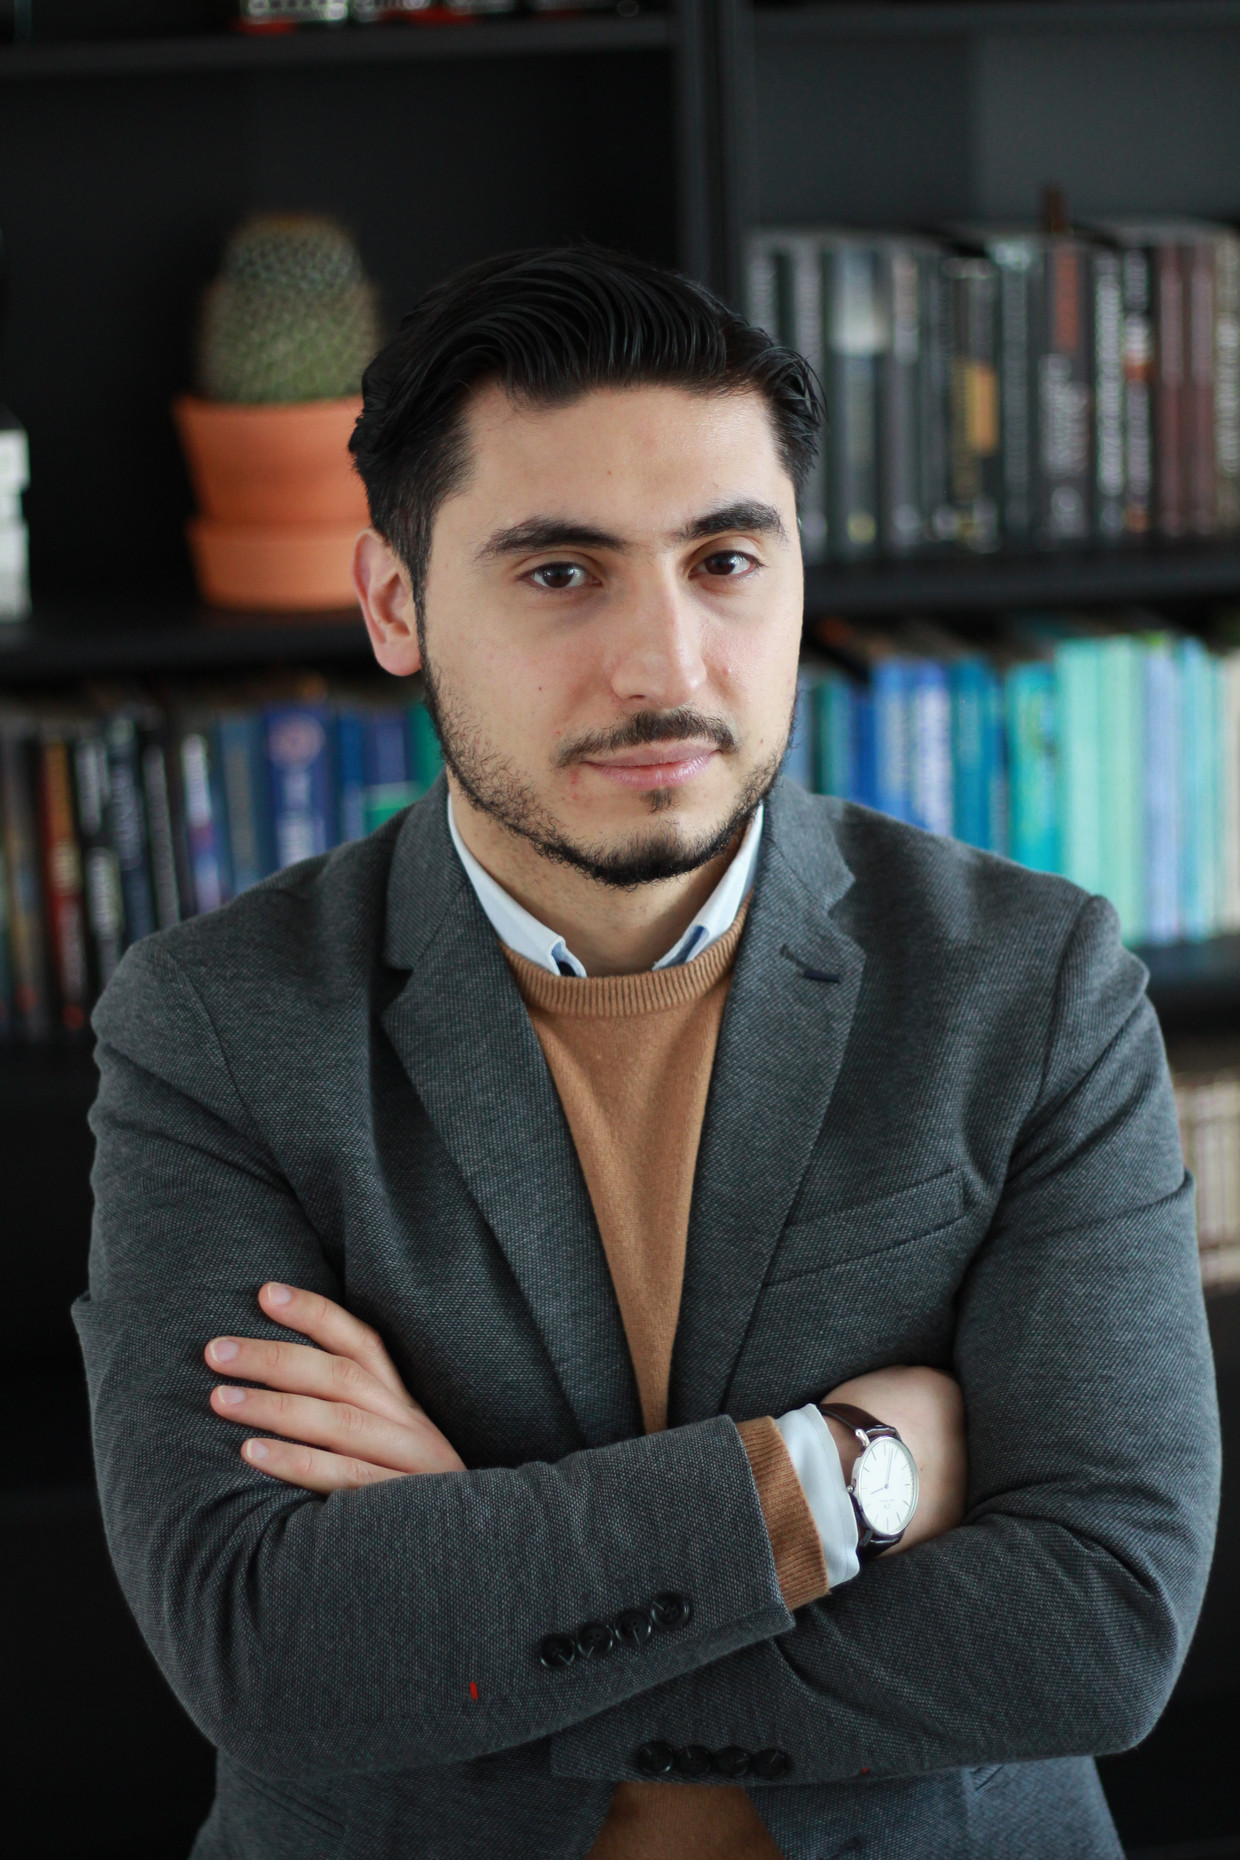 Ömer Karaca, woordvoerder van Milli Görüs. Beeld -